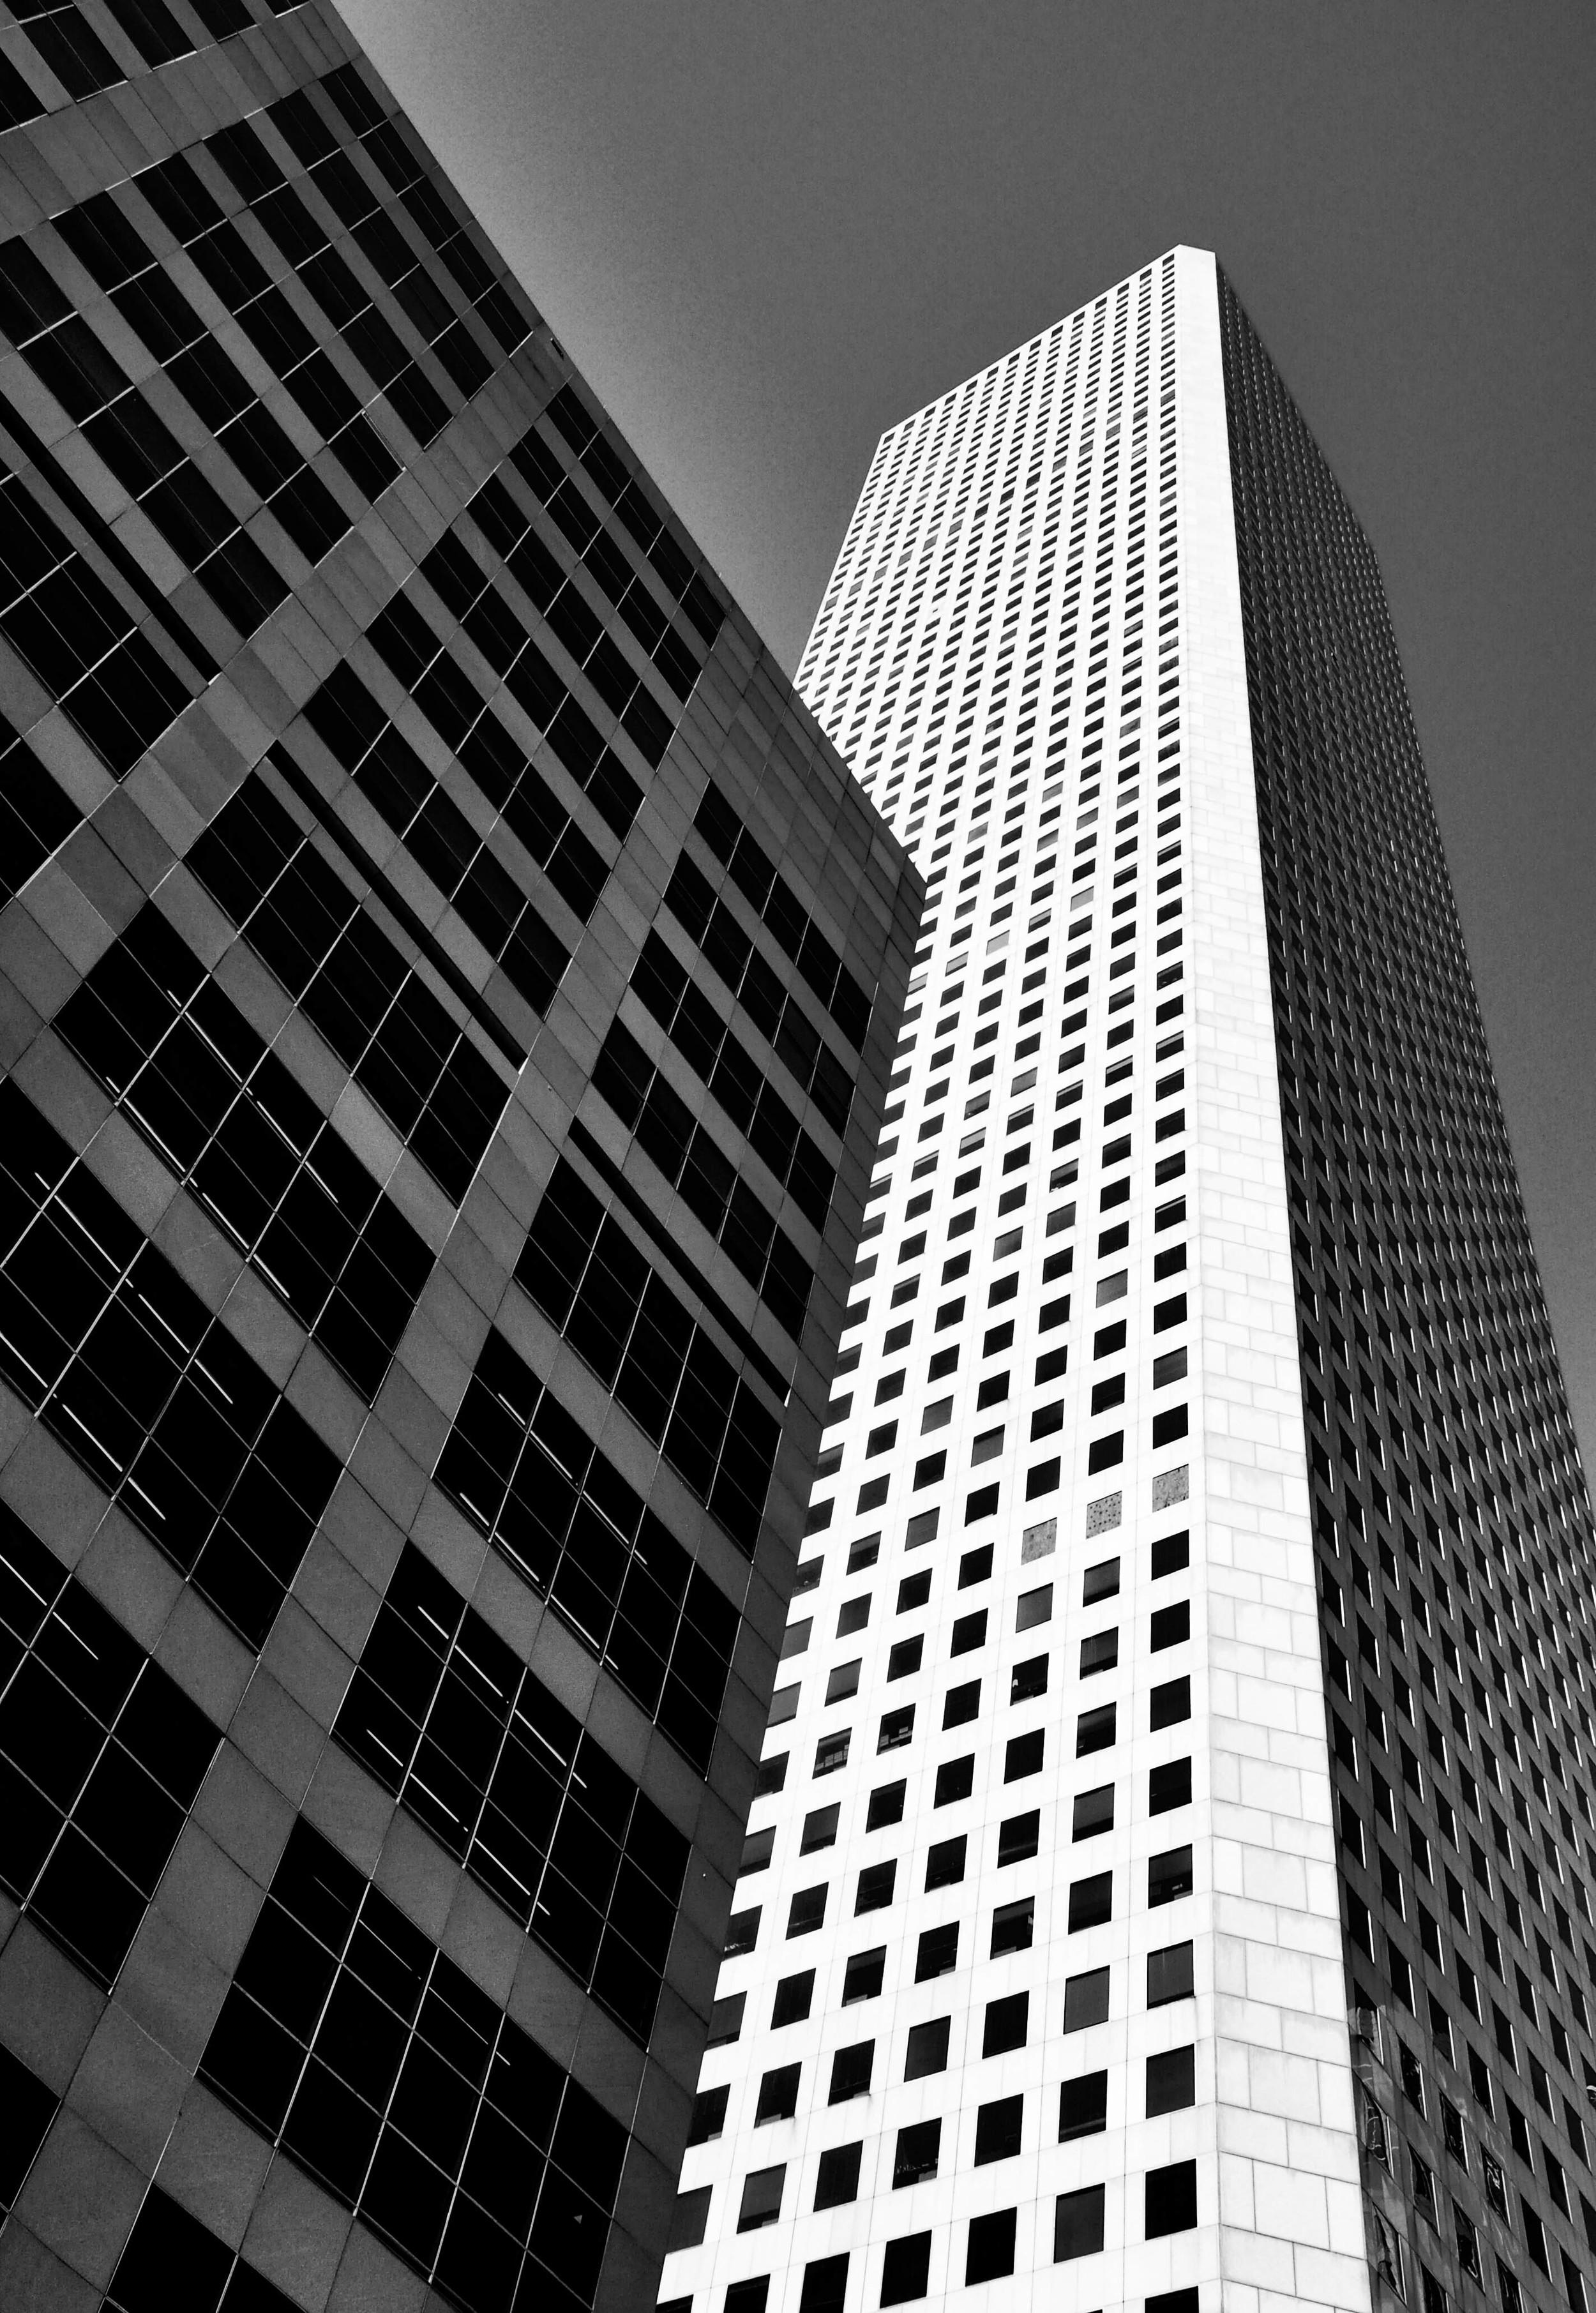 Squares and Rectangles  Houston, TX  ©Copyright 2015 Bridget Barnes